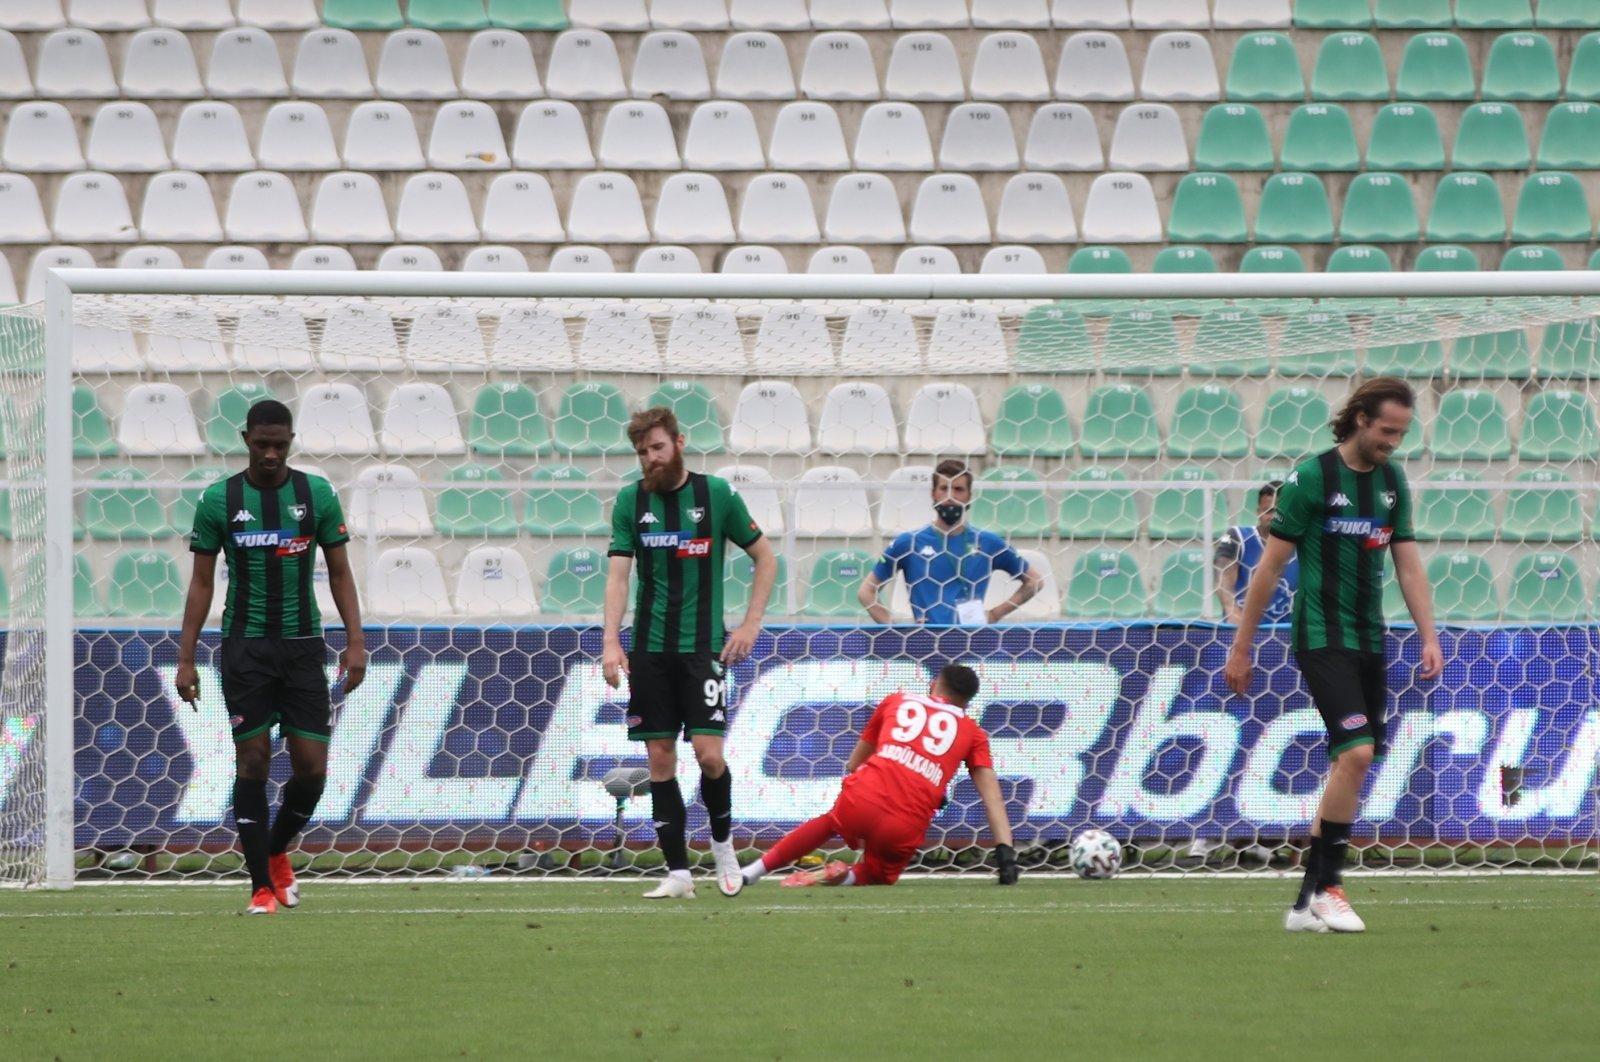 Denizlispor players react after conceding a goal against Rizespor in the Turkish Süper Lig at the Atatürk Stadium, Denizli, western Turkey, May 2, 2021 (AA Photo)